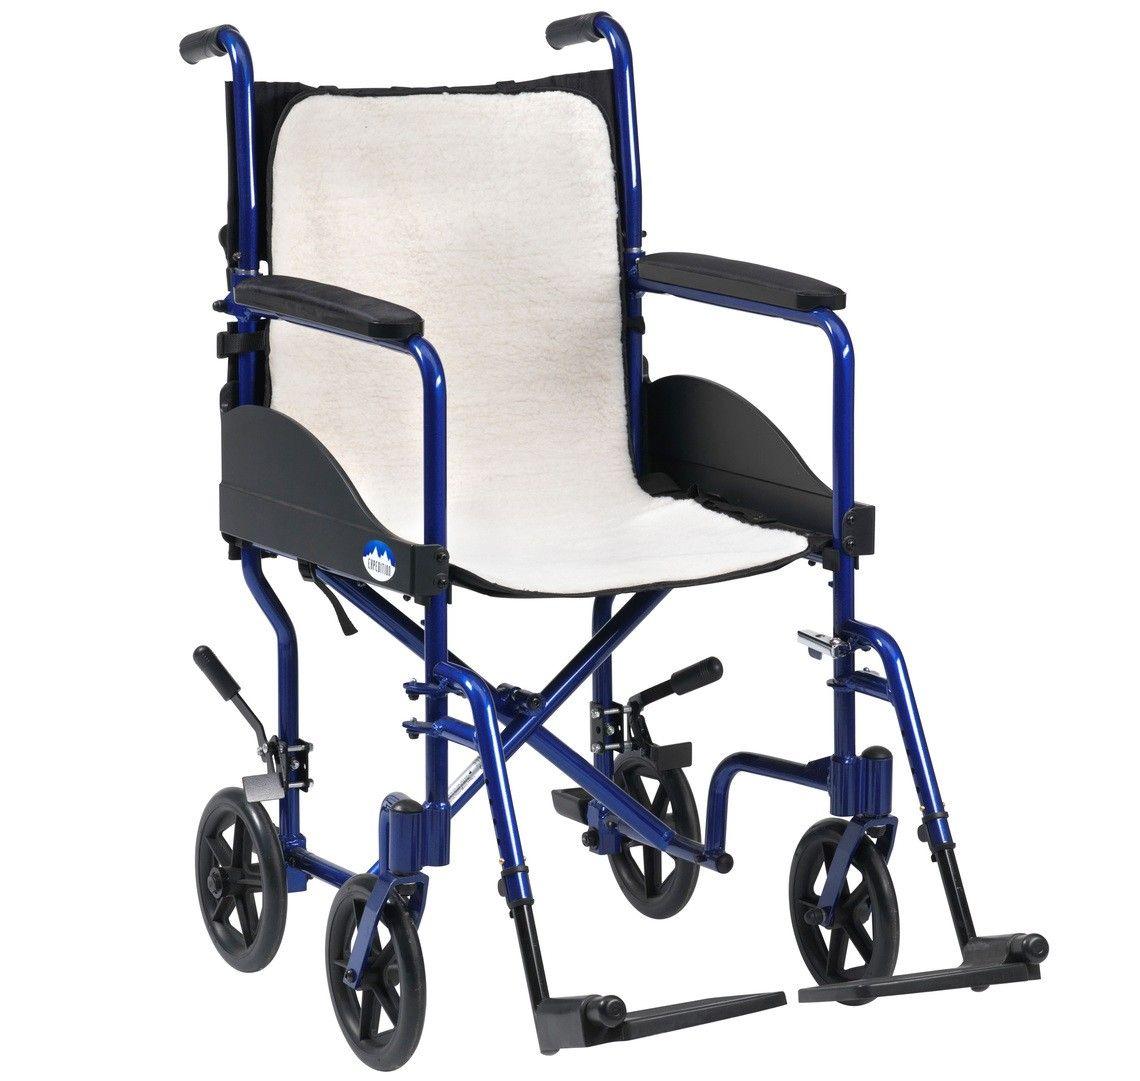 Overlay fleece cushion for wheelchairs